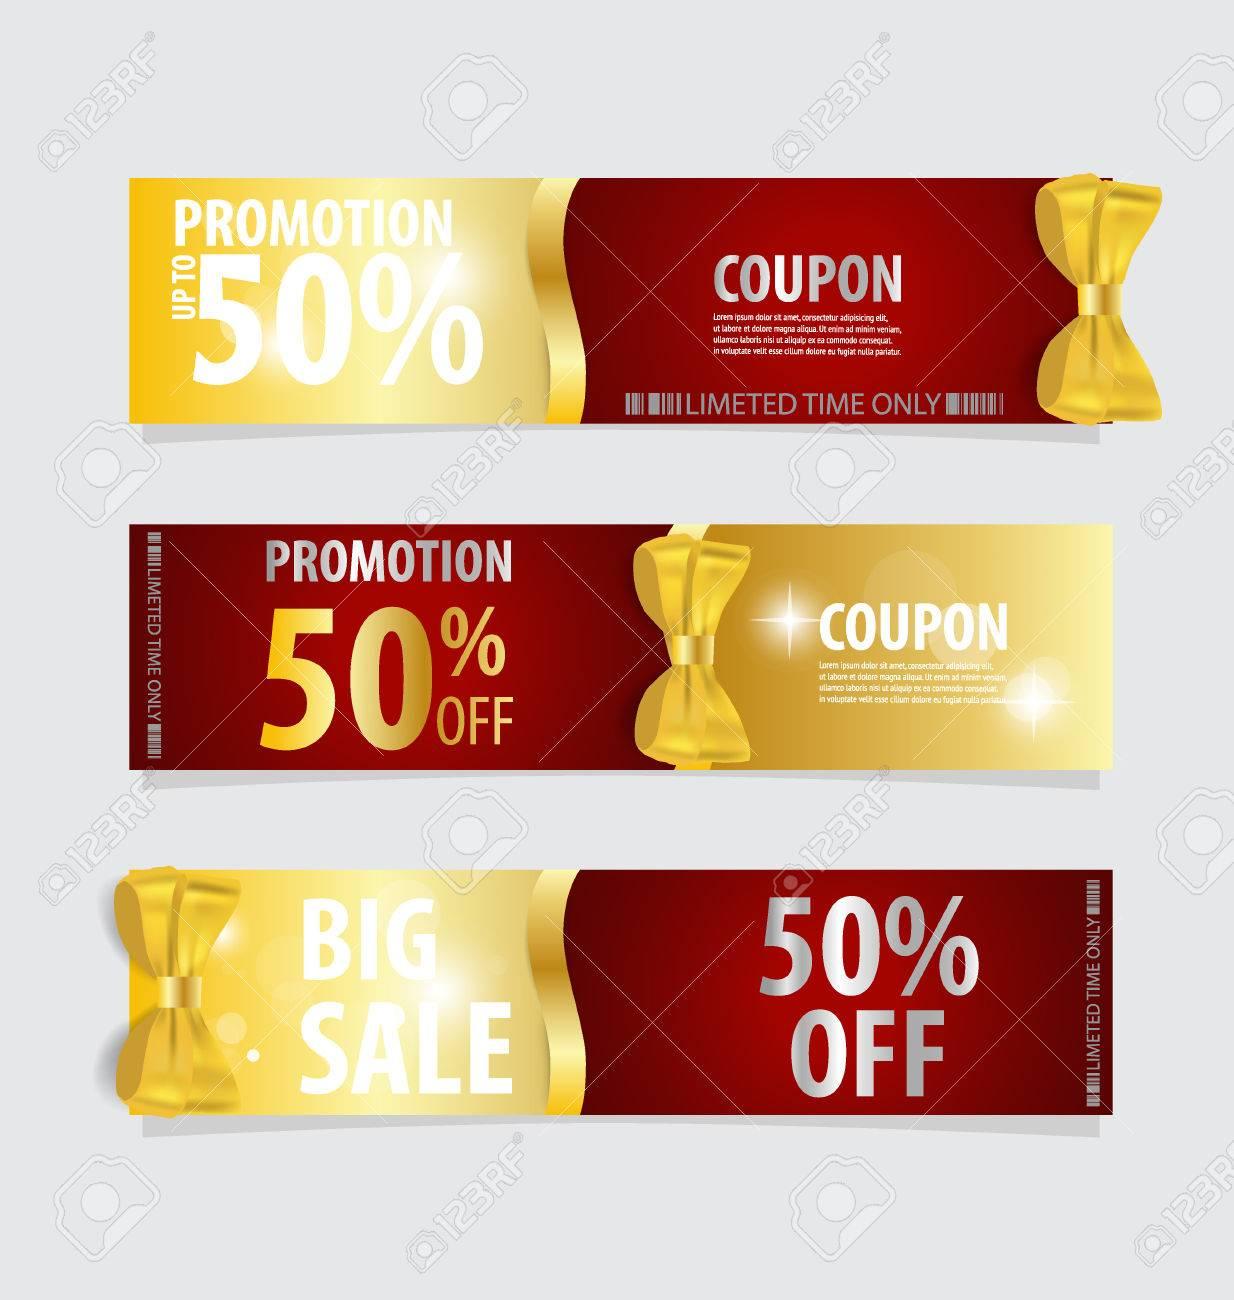 gift coupons gift bows and ribbons vector illustration gift coupons gift bows and ribbons vector illustration stock vector 45980344